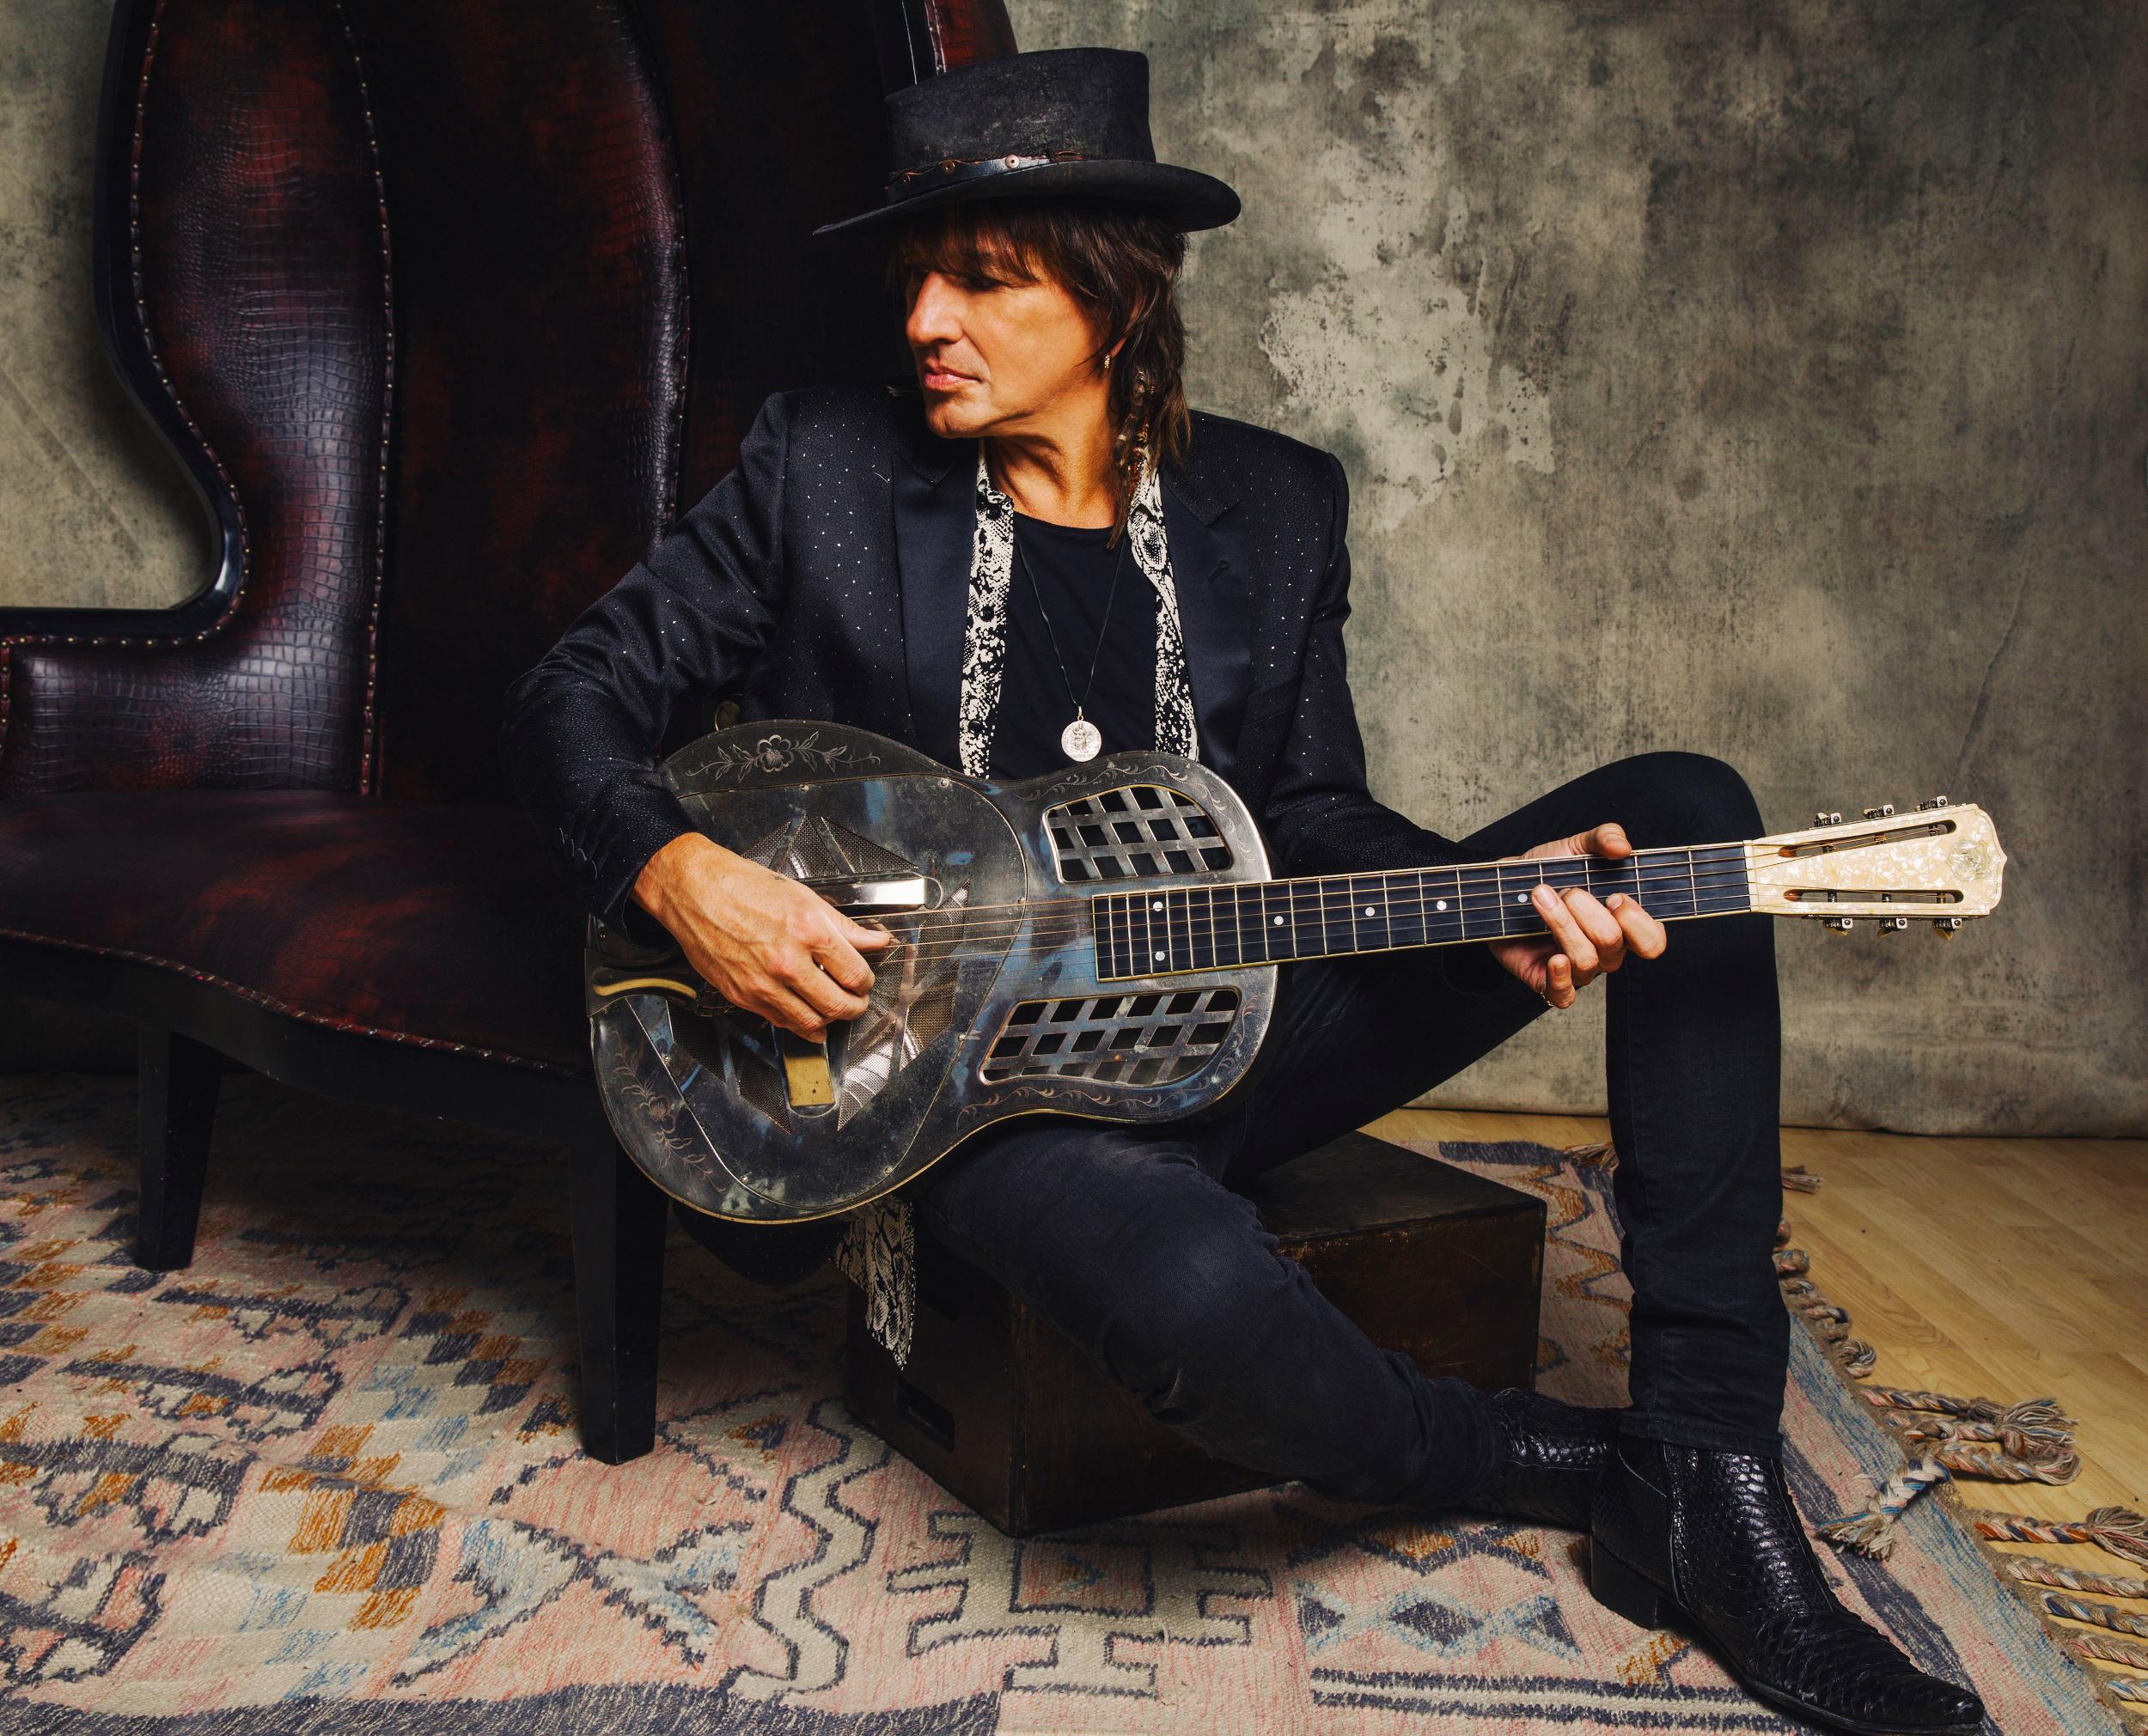 Richie Sambora Rock And Roll Hall Of Fame